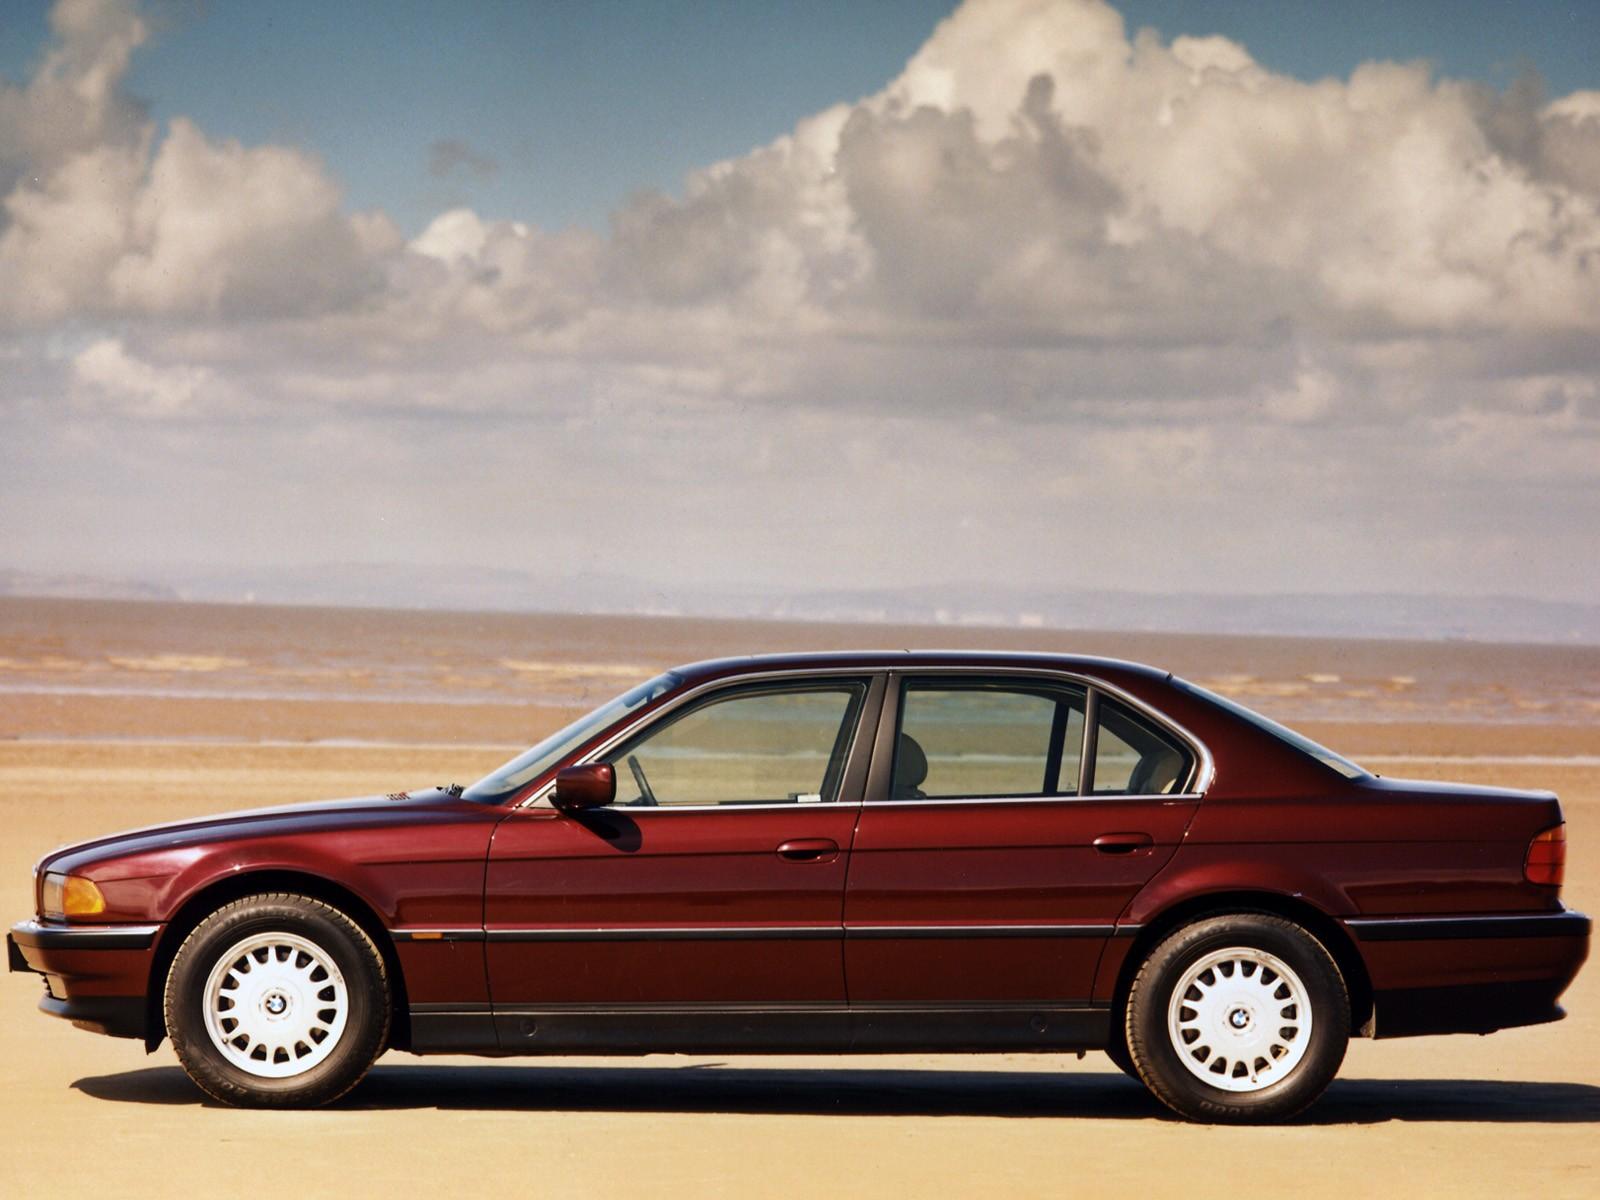 BMW 7 Series (E38) - 1994, 1995, 1996, 1997, 1998 ...